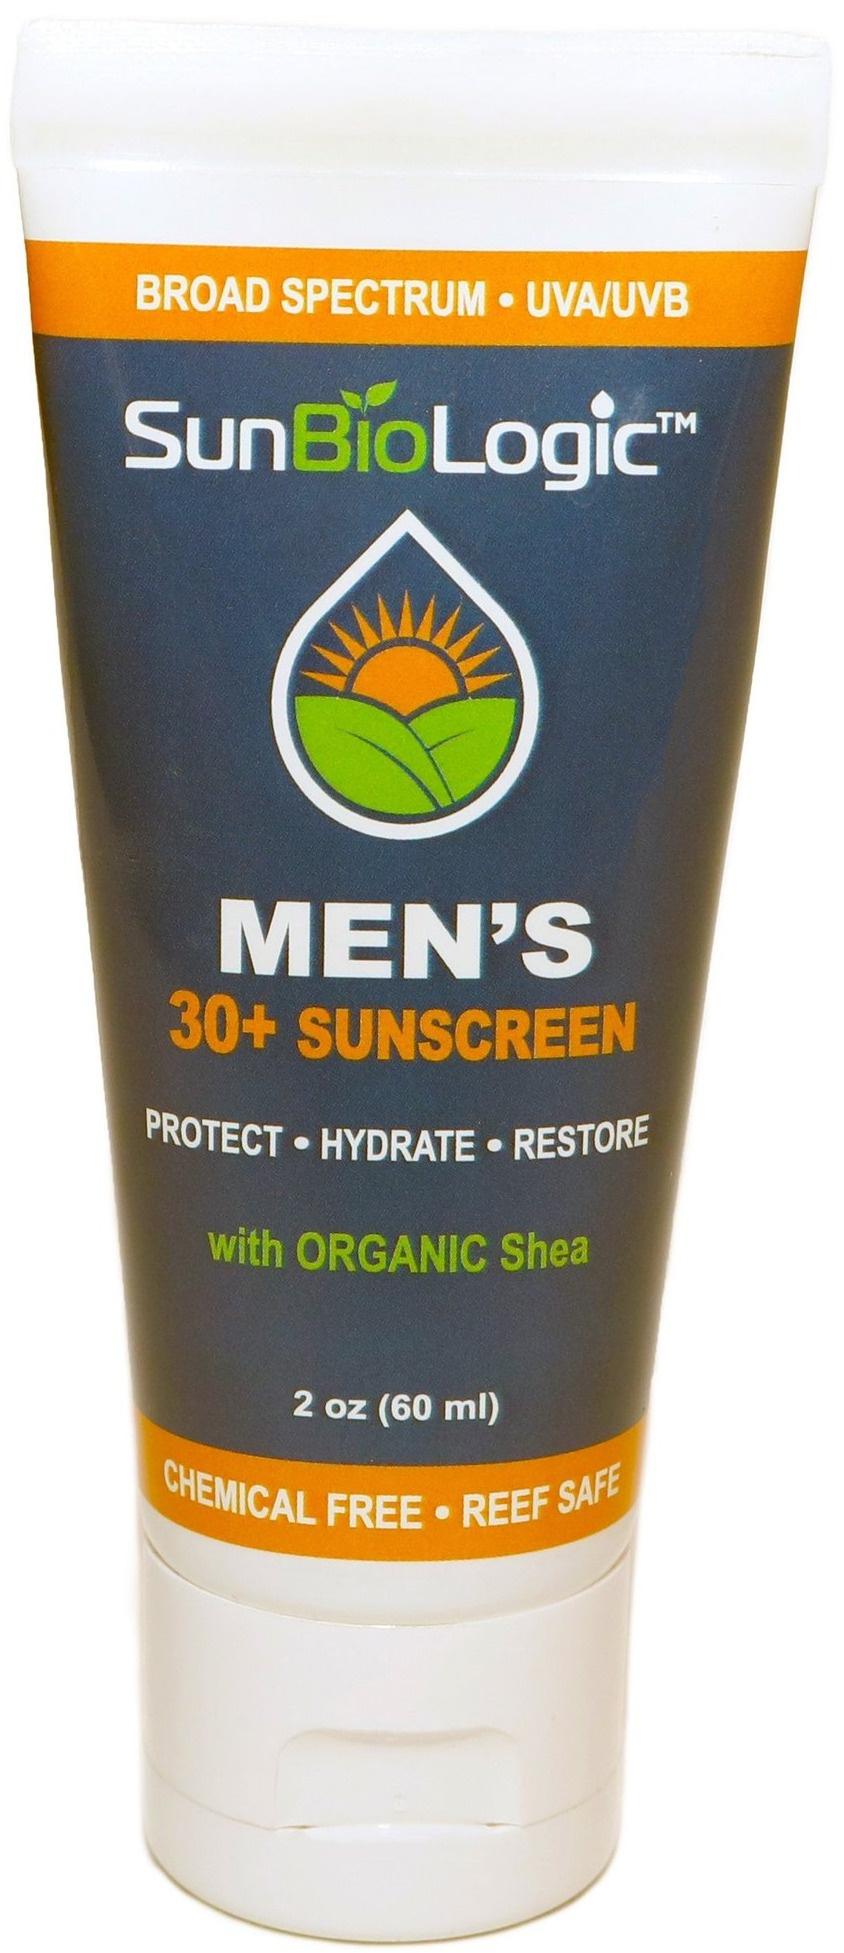 SunBioLogic Organic Sunscreen - Mens SPF 30+